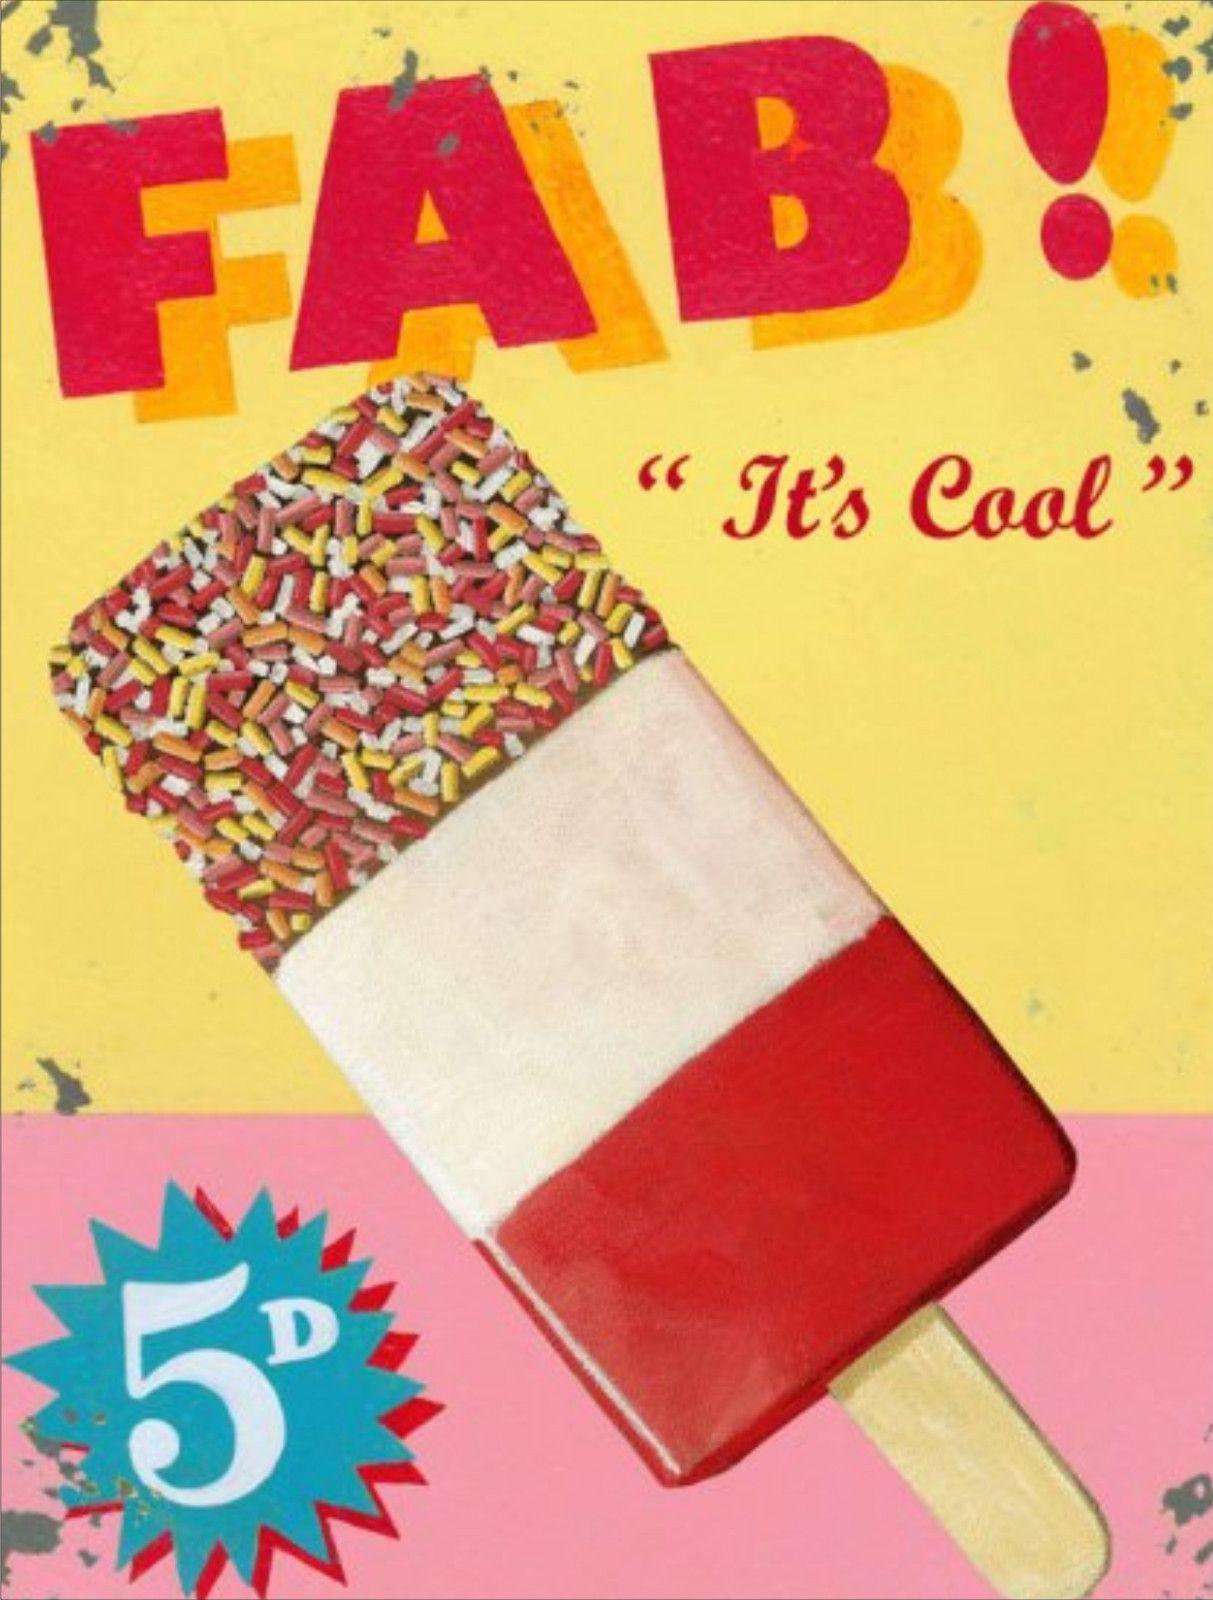 Ice lolly Ice cream Retro Metal Wall Plaque Art Vintage advertisement tin Sign